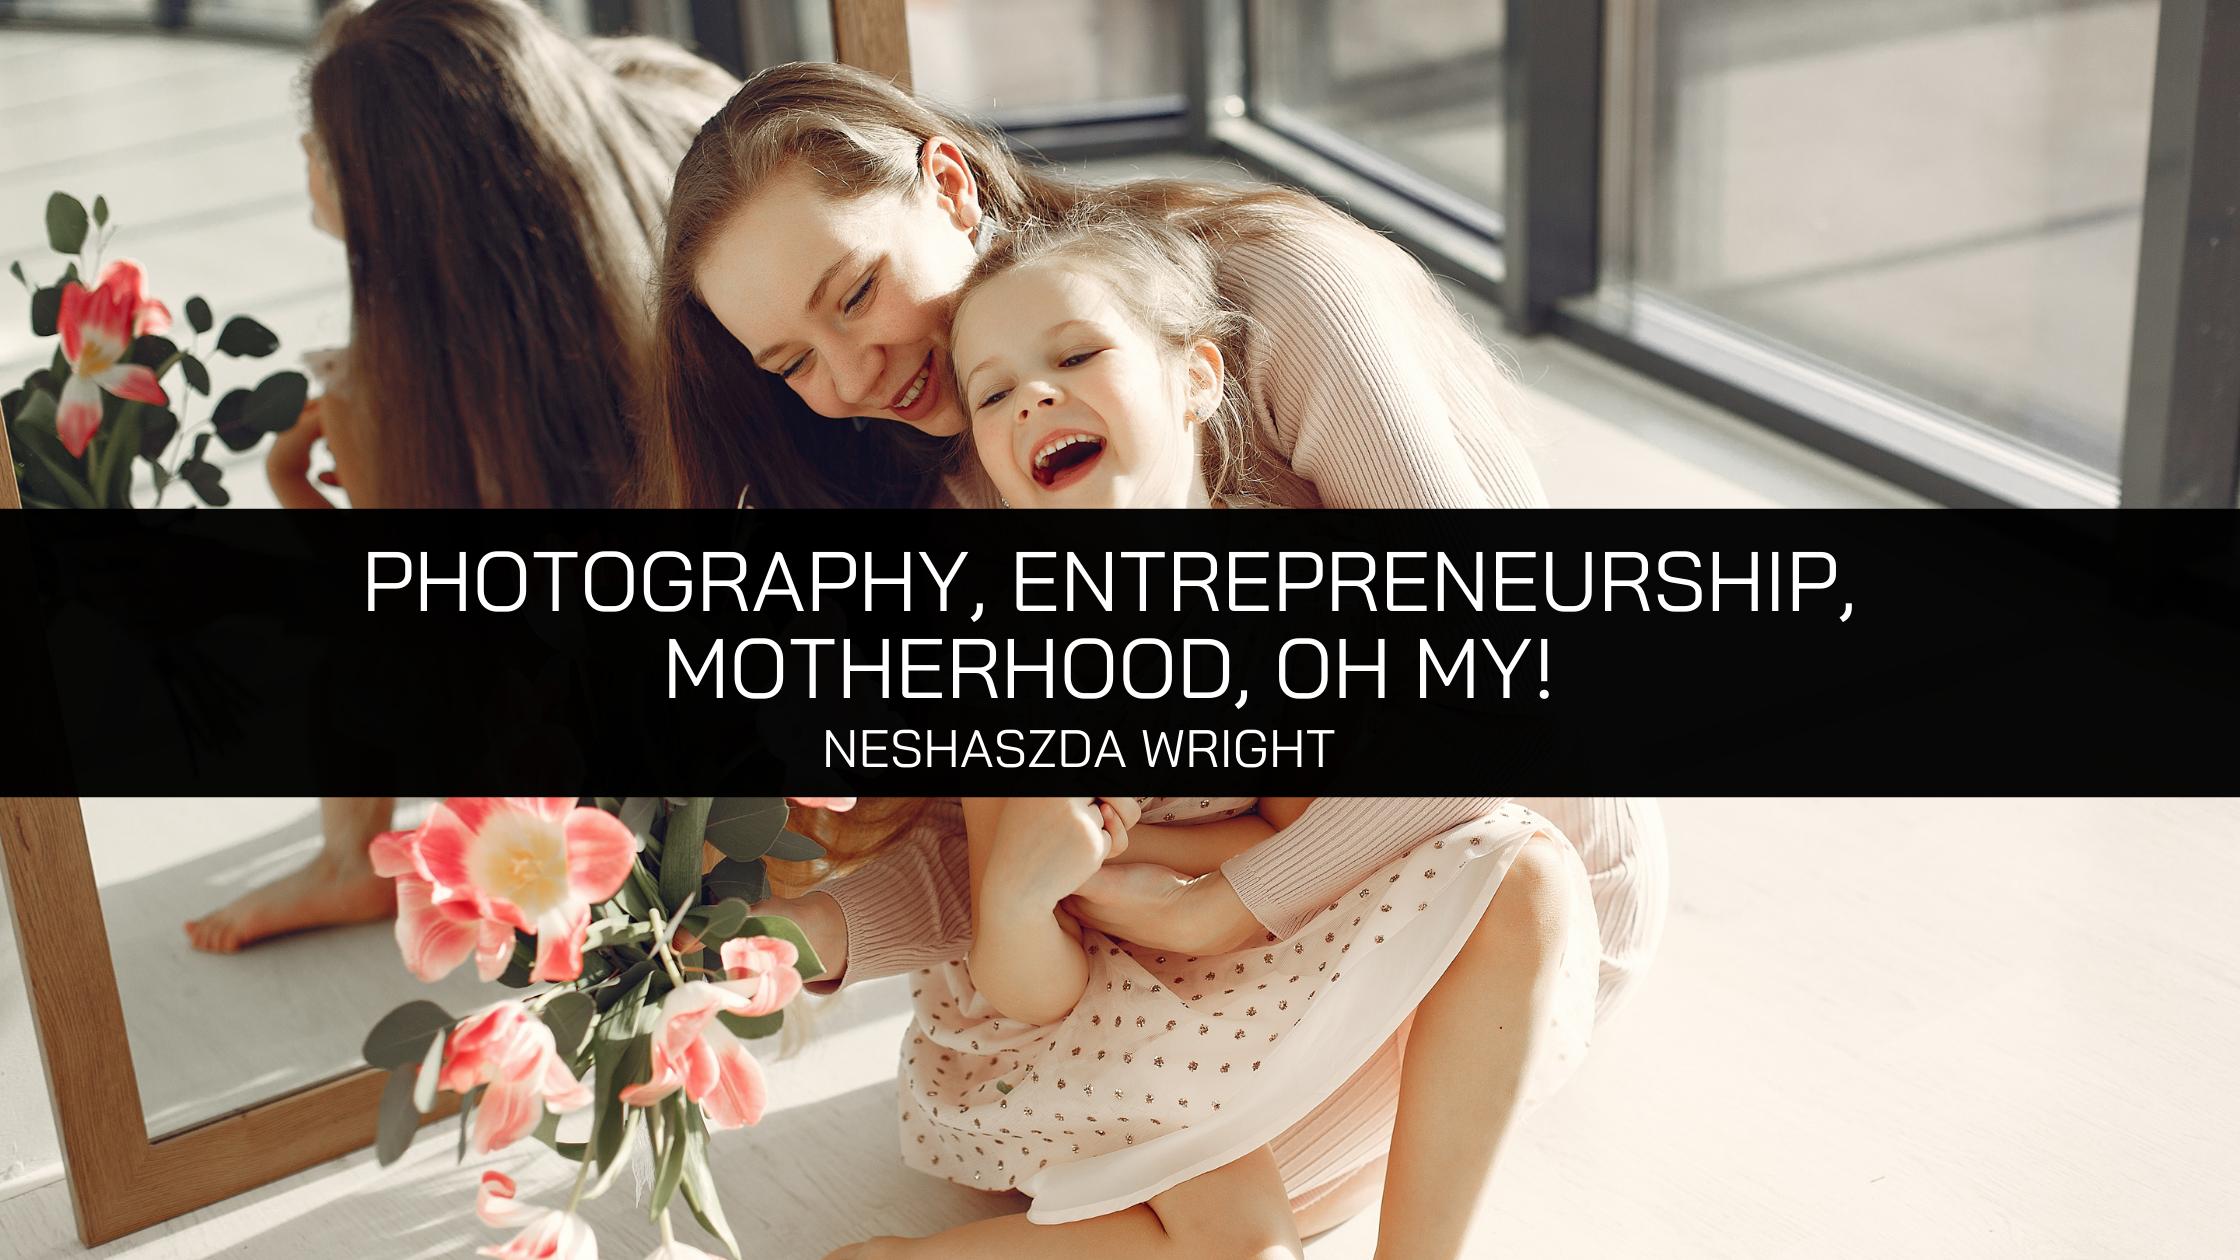 Photography, Entrepreneurship, Motherhood, Oh My! Mompreneur Neshaszda Wright Prevails Through Pandemic